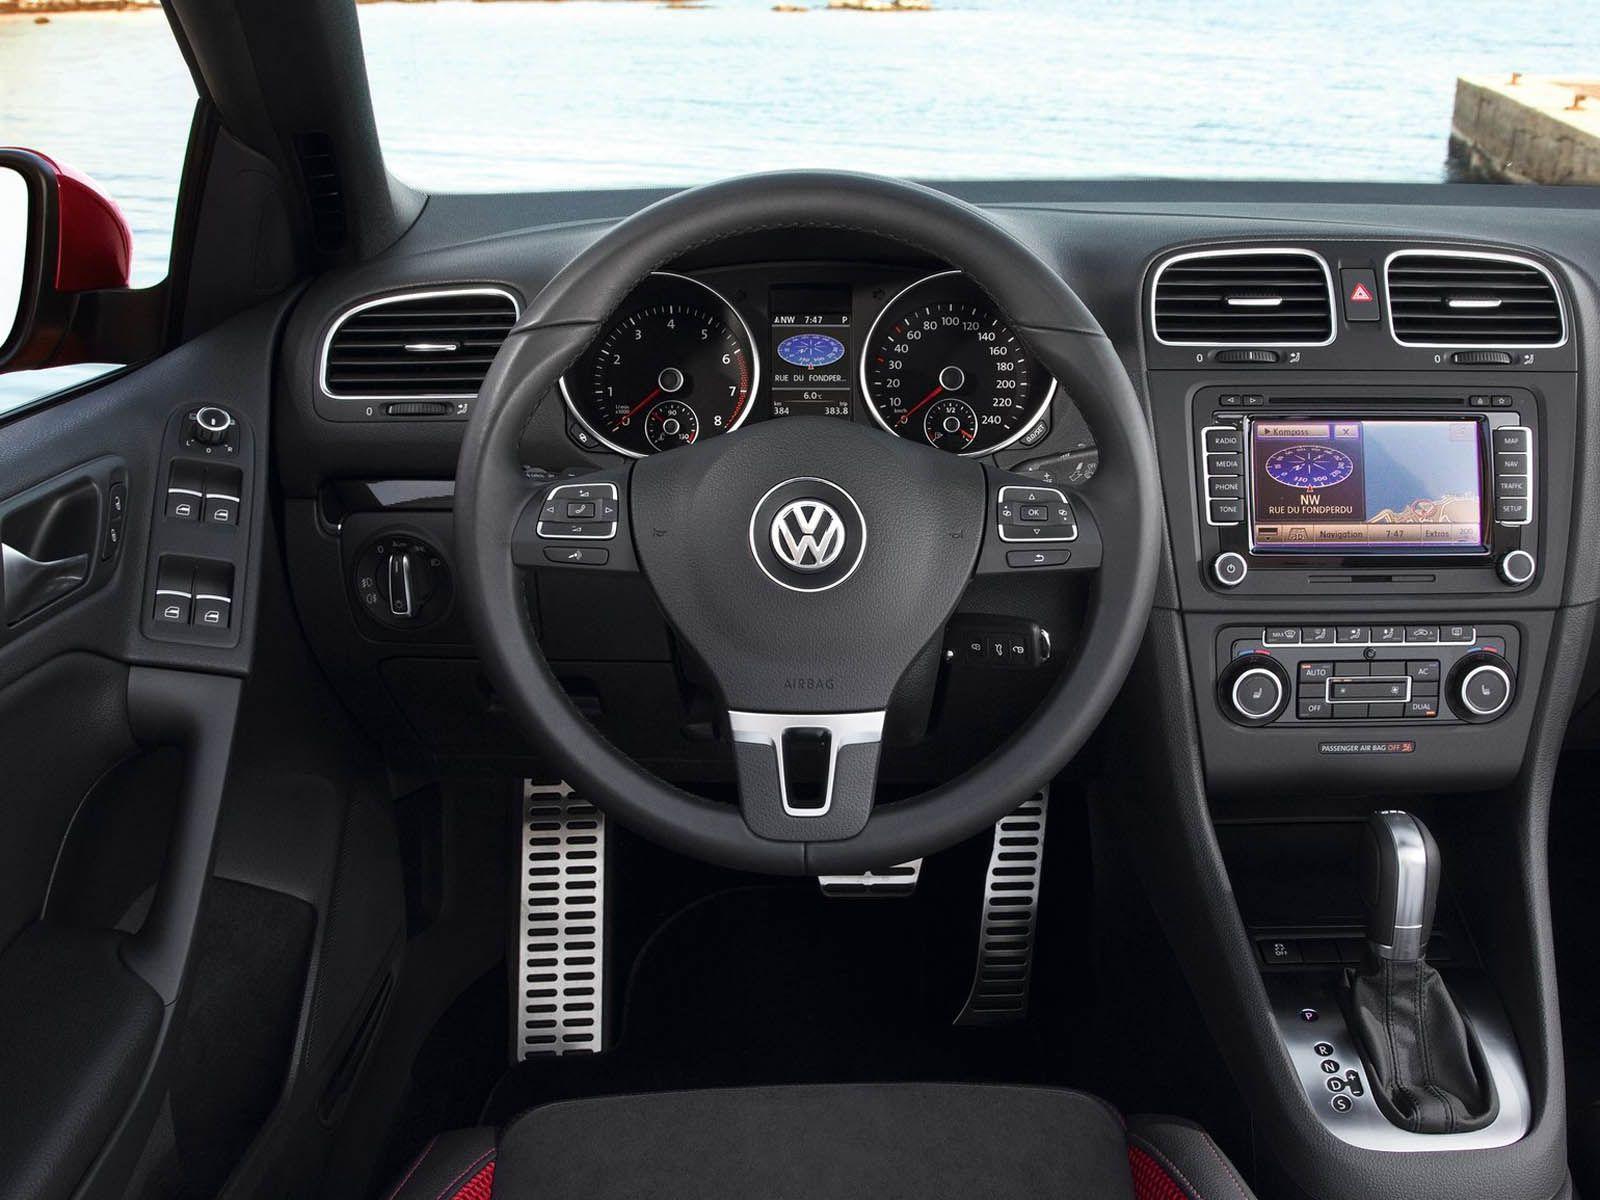 Volkswagen Golf Cabriolet 2012 Interior Volkswagen Cabriolets